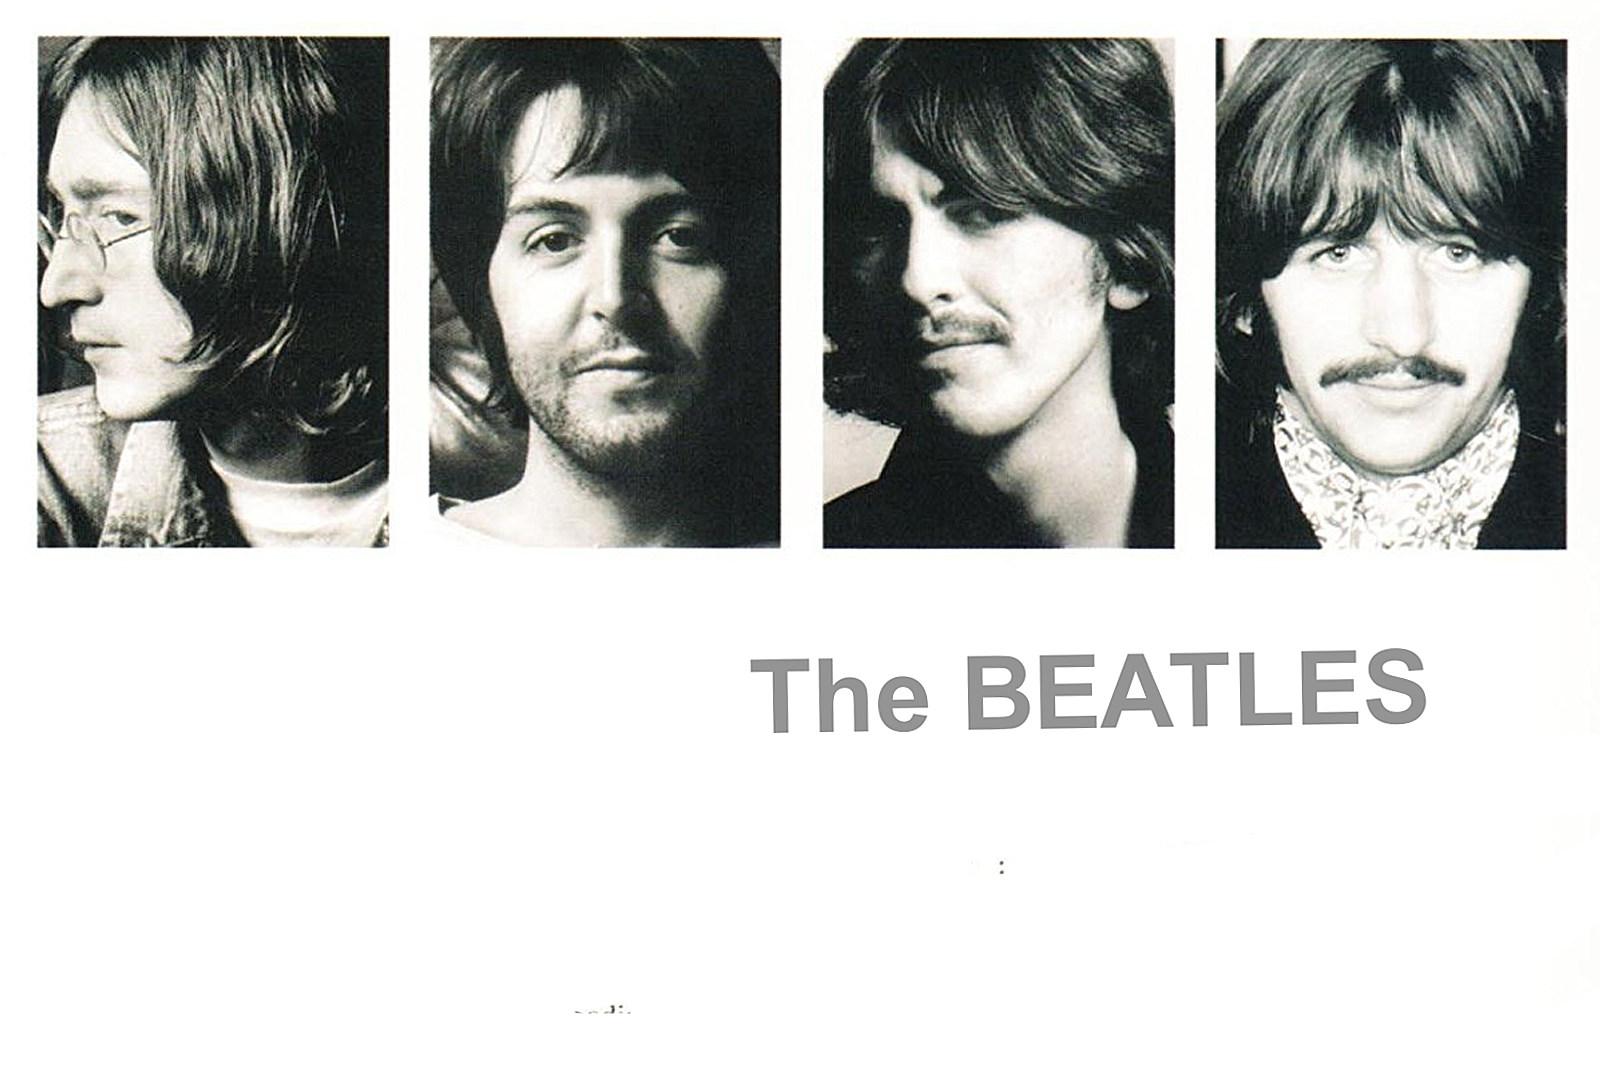 Beatles White Album Songs Ranked Worst To Best